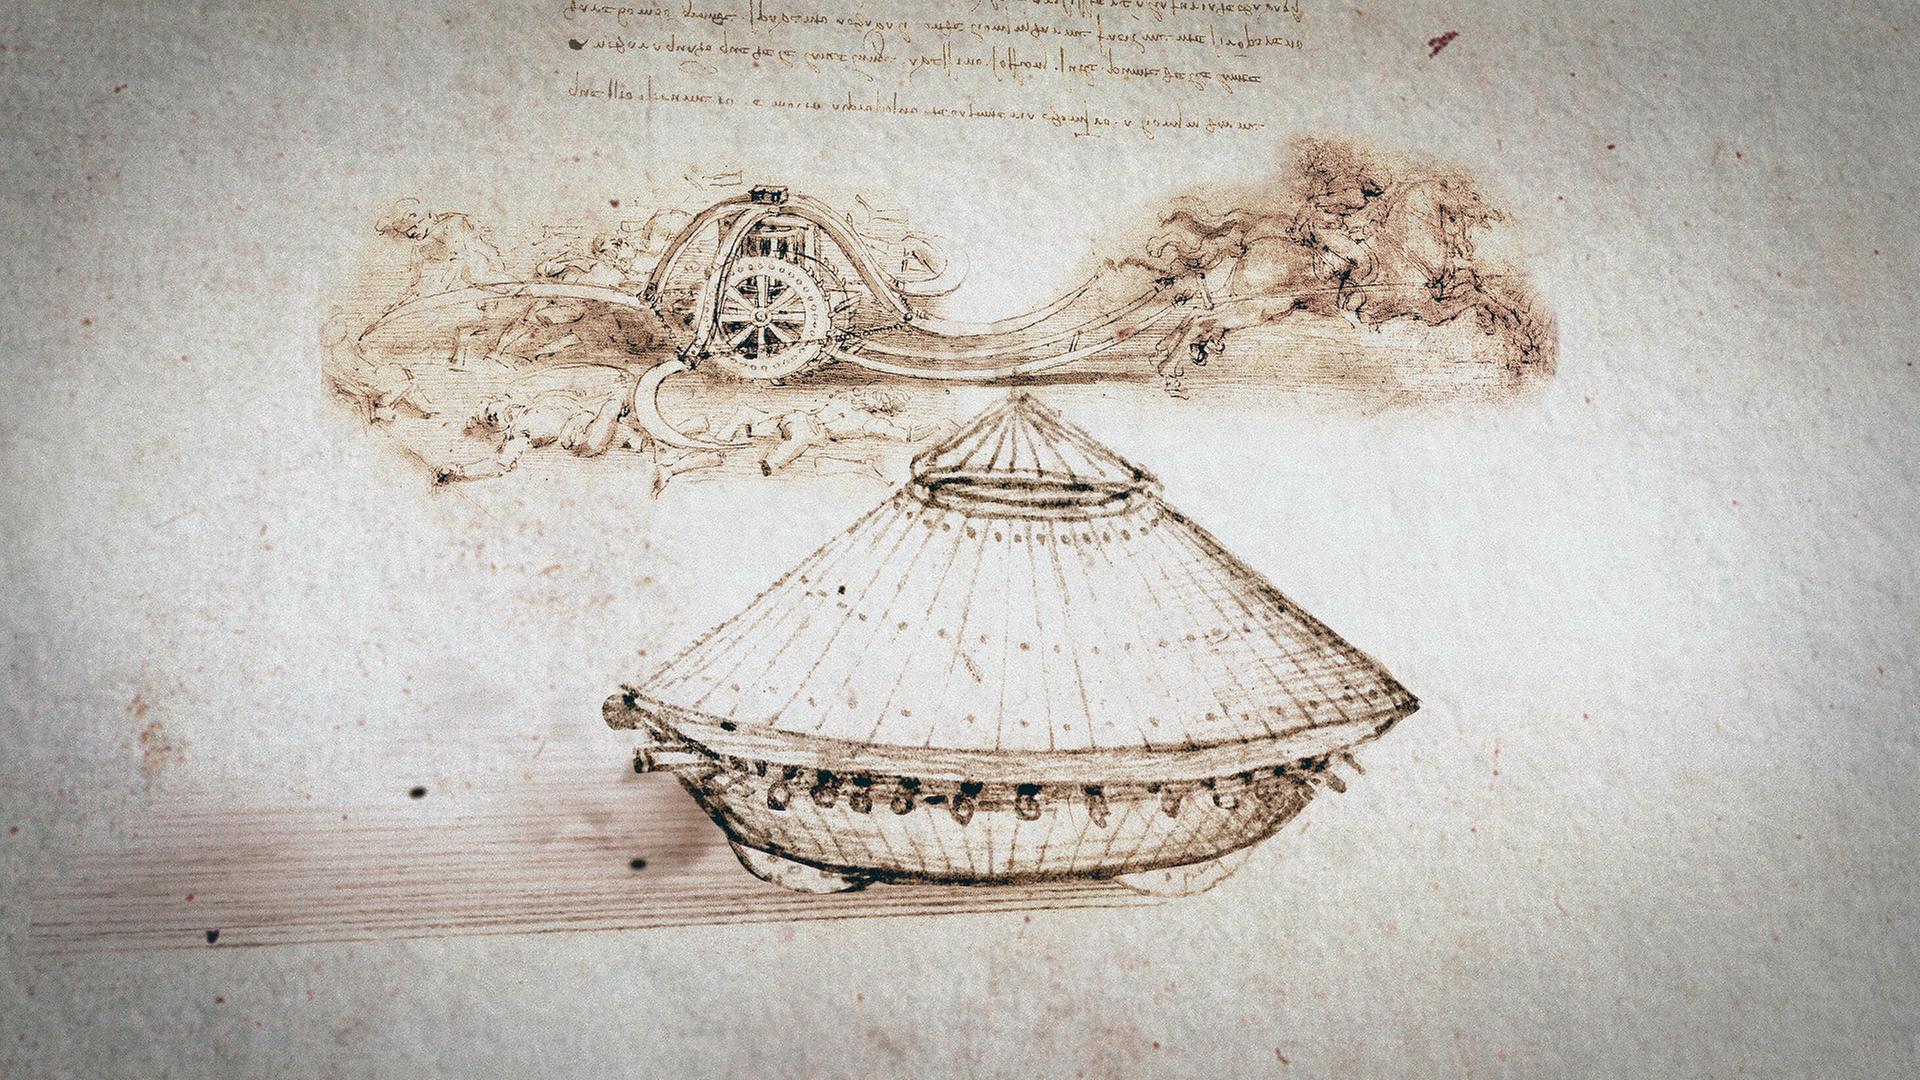 Leonardo da Vinci - Was erfand er wirklich? - ZDFmediathek